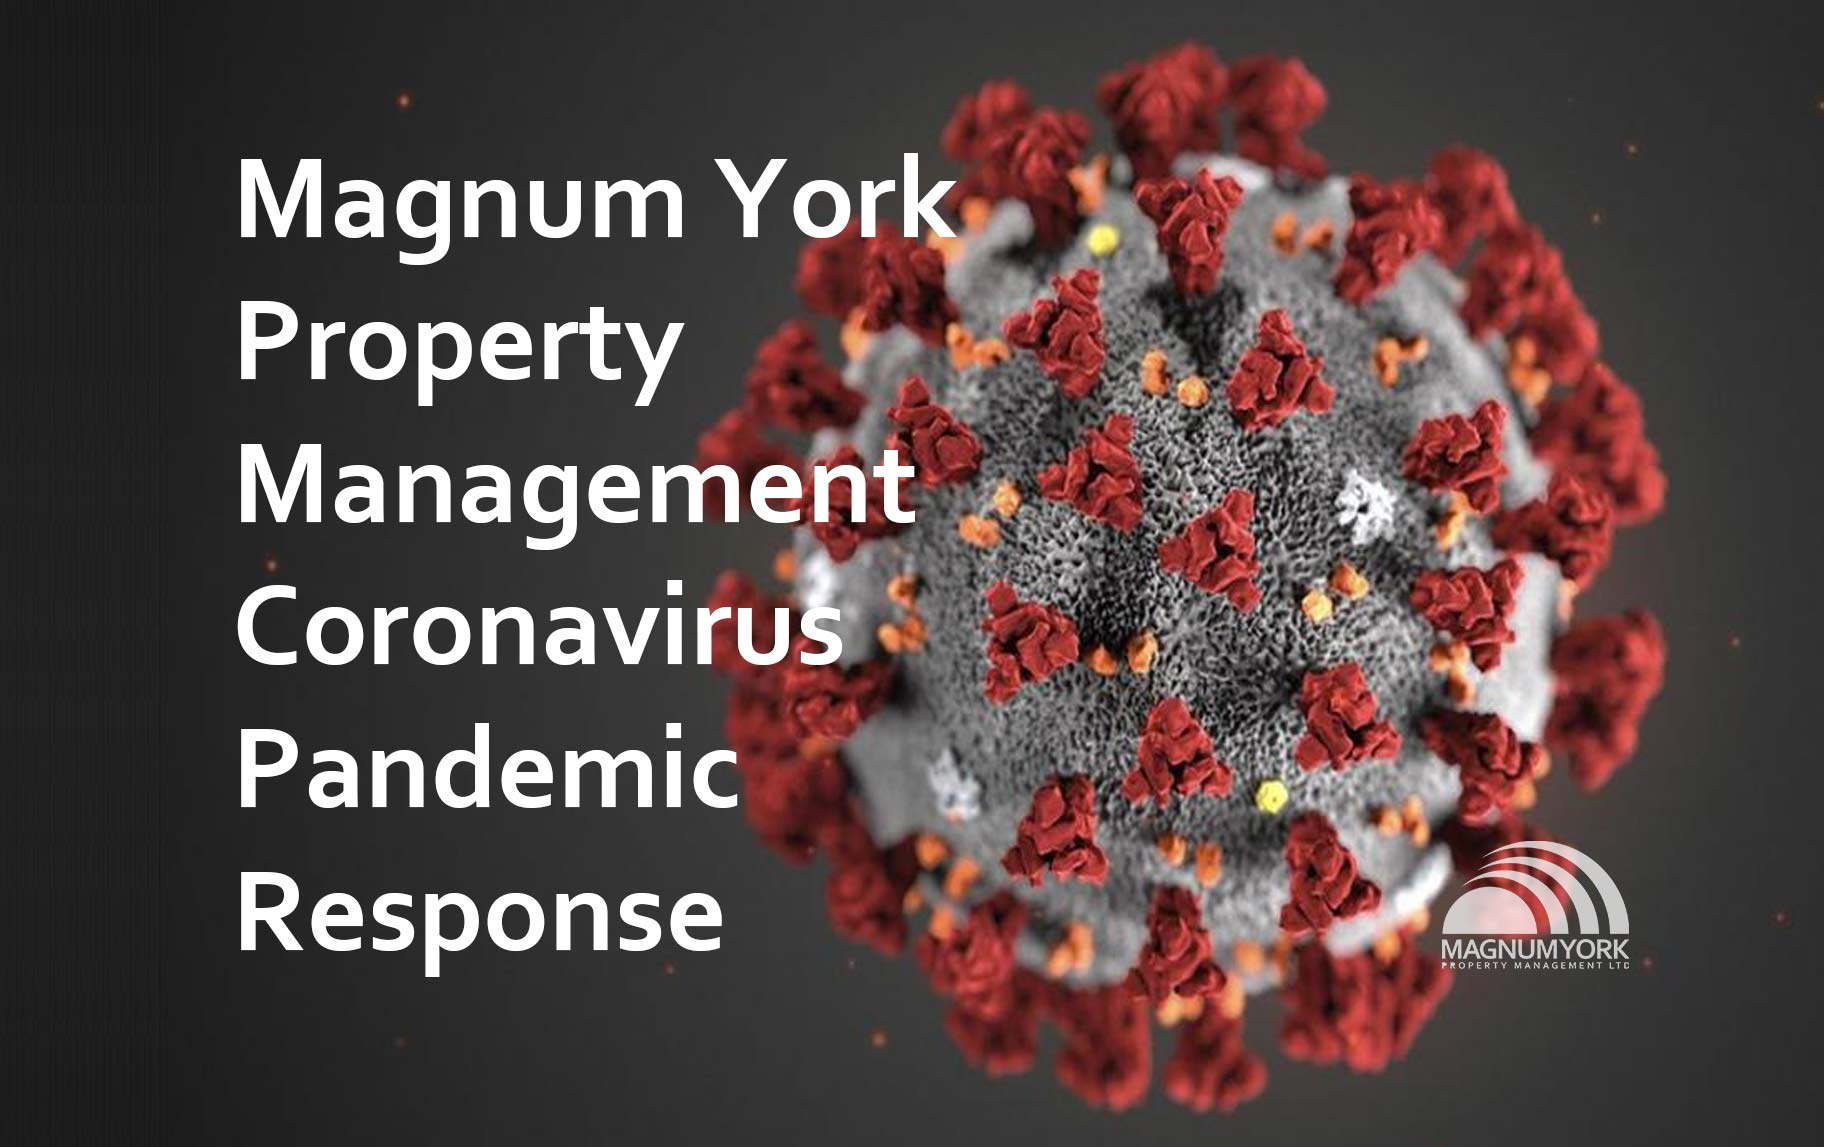 Magnum York Property Management Coronavirus Pandemic Response Covid-19